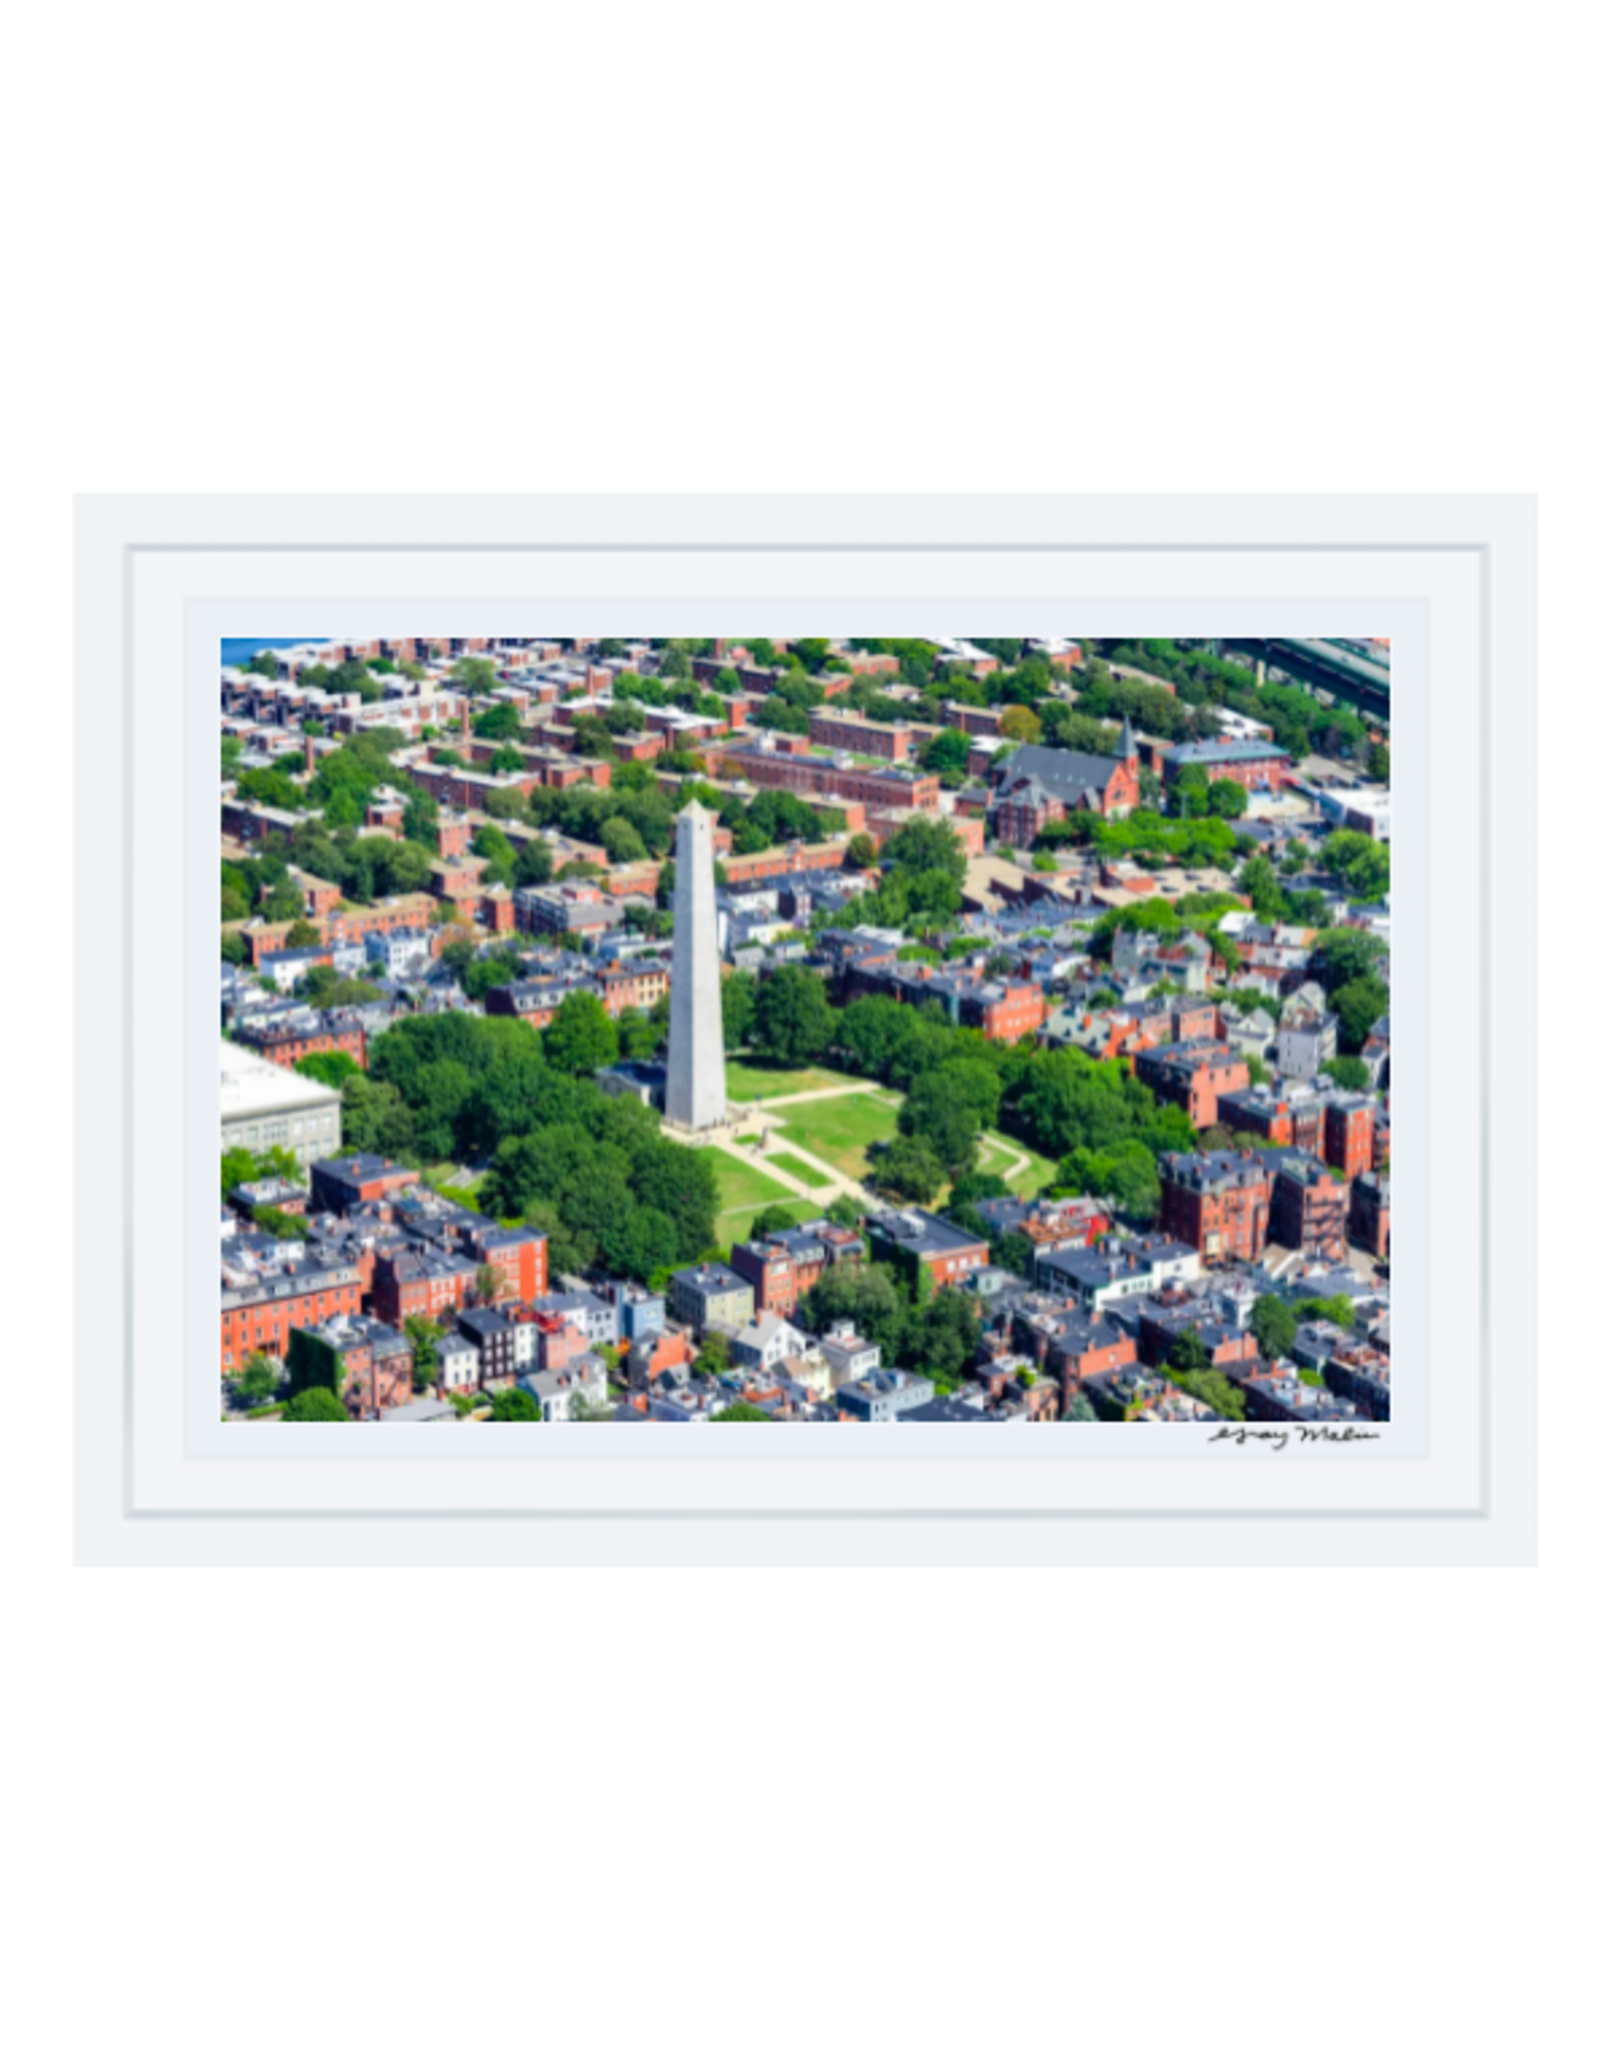 Gray Malin Bunker Hill by Gray Malin 11.5x17